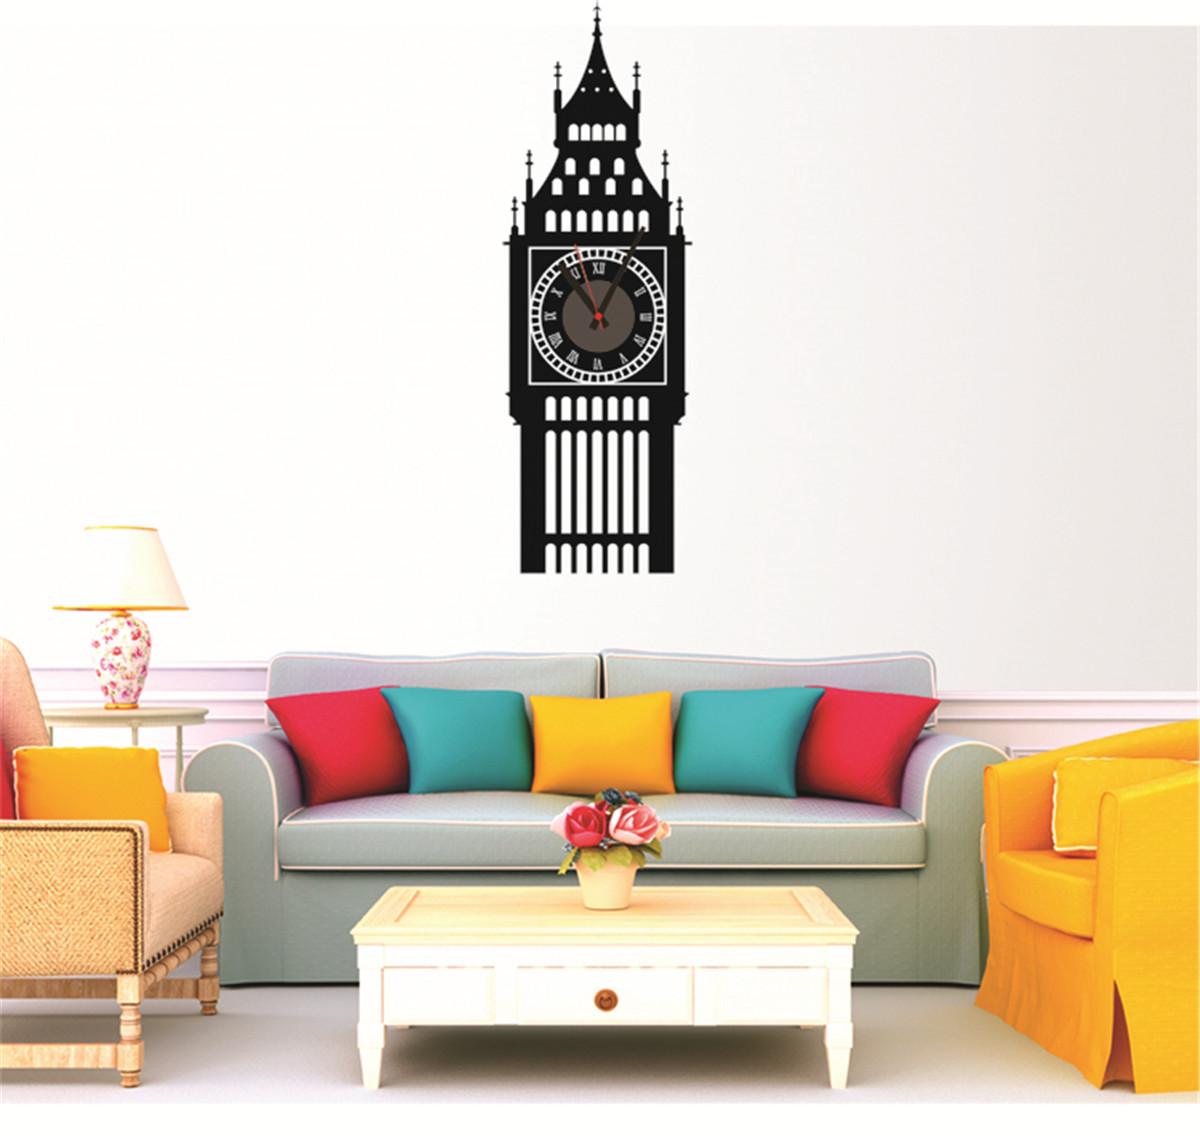 Home Living Room DIY Big Ben Office Room Decor 3D Mirror Sticker ...